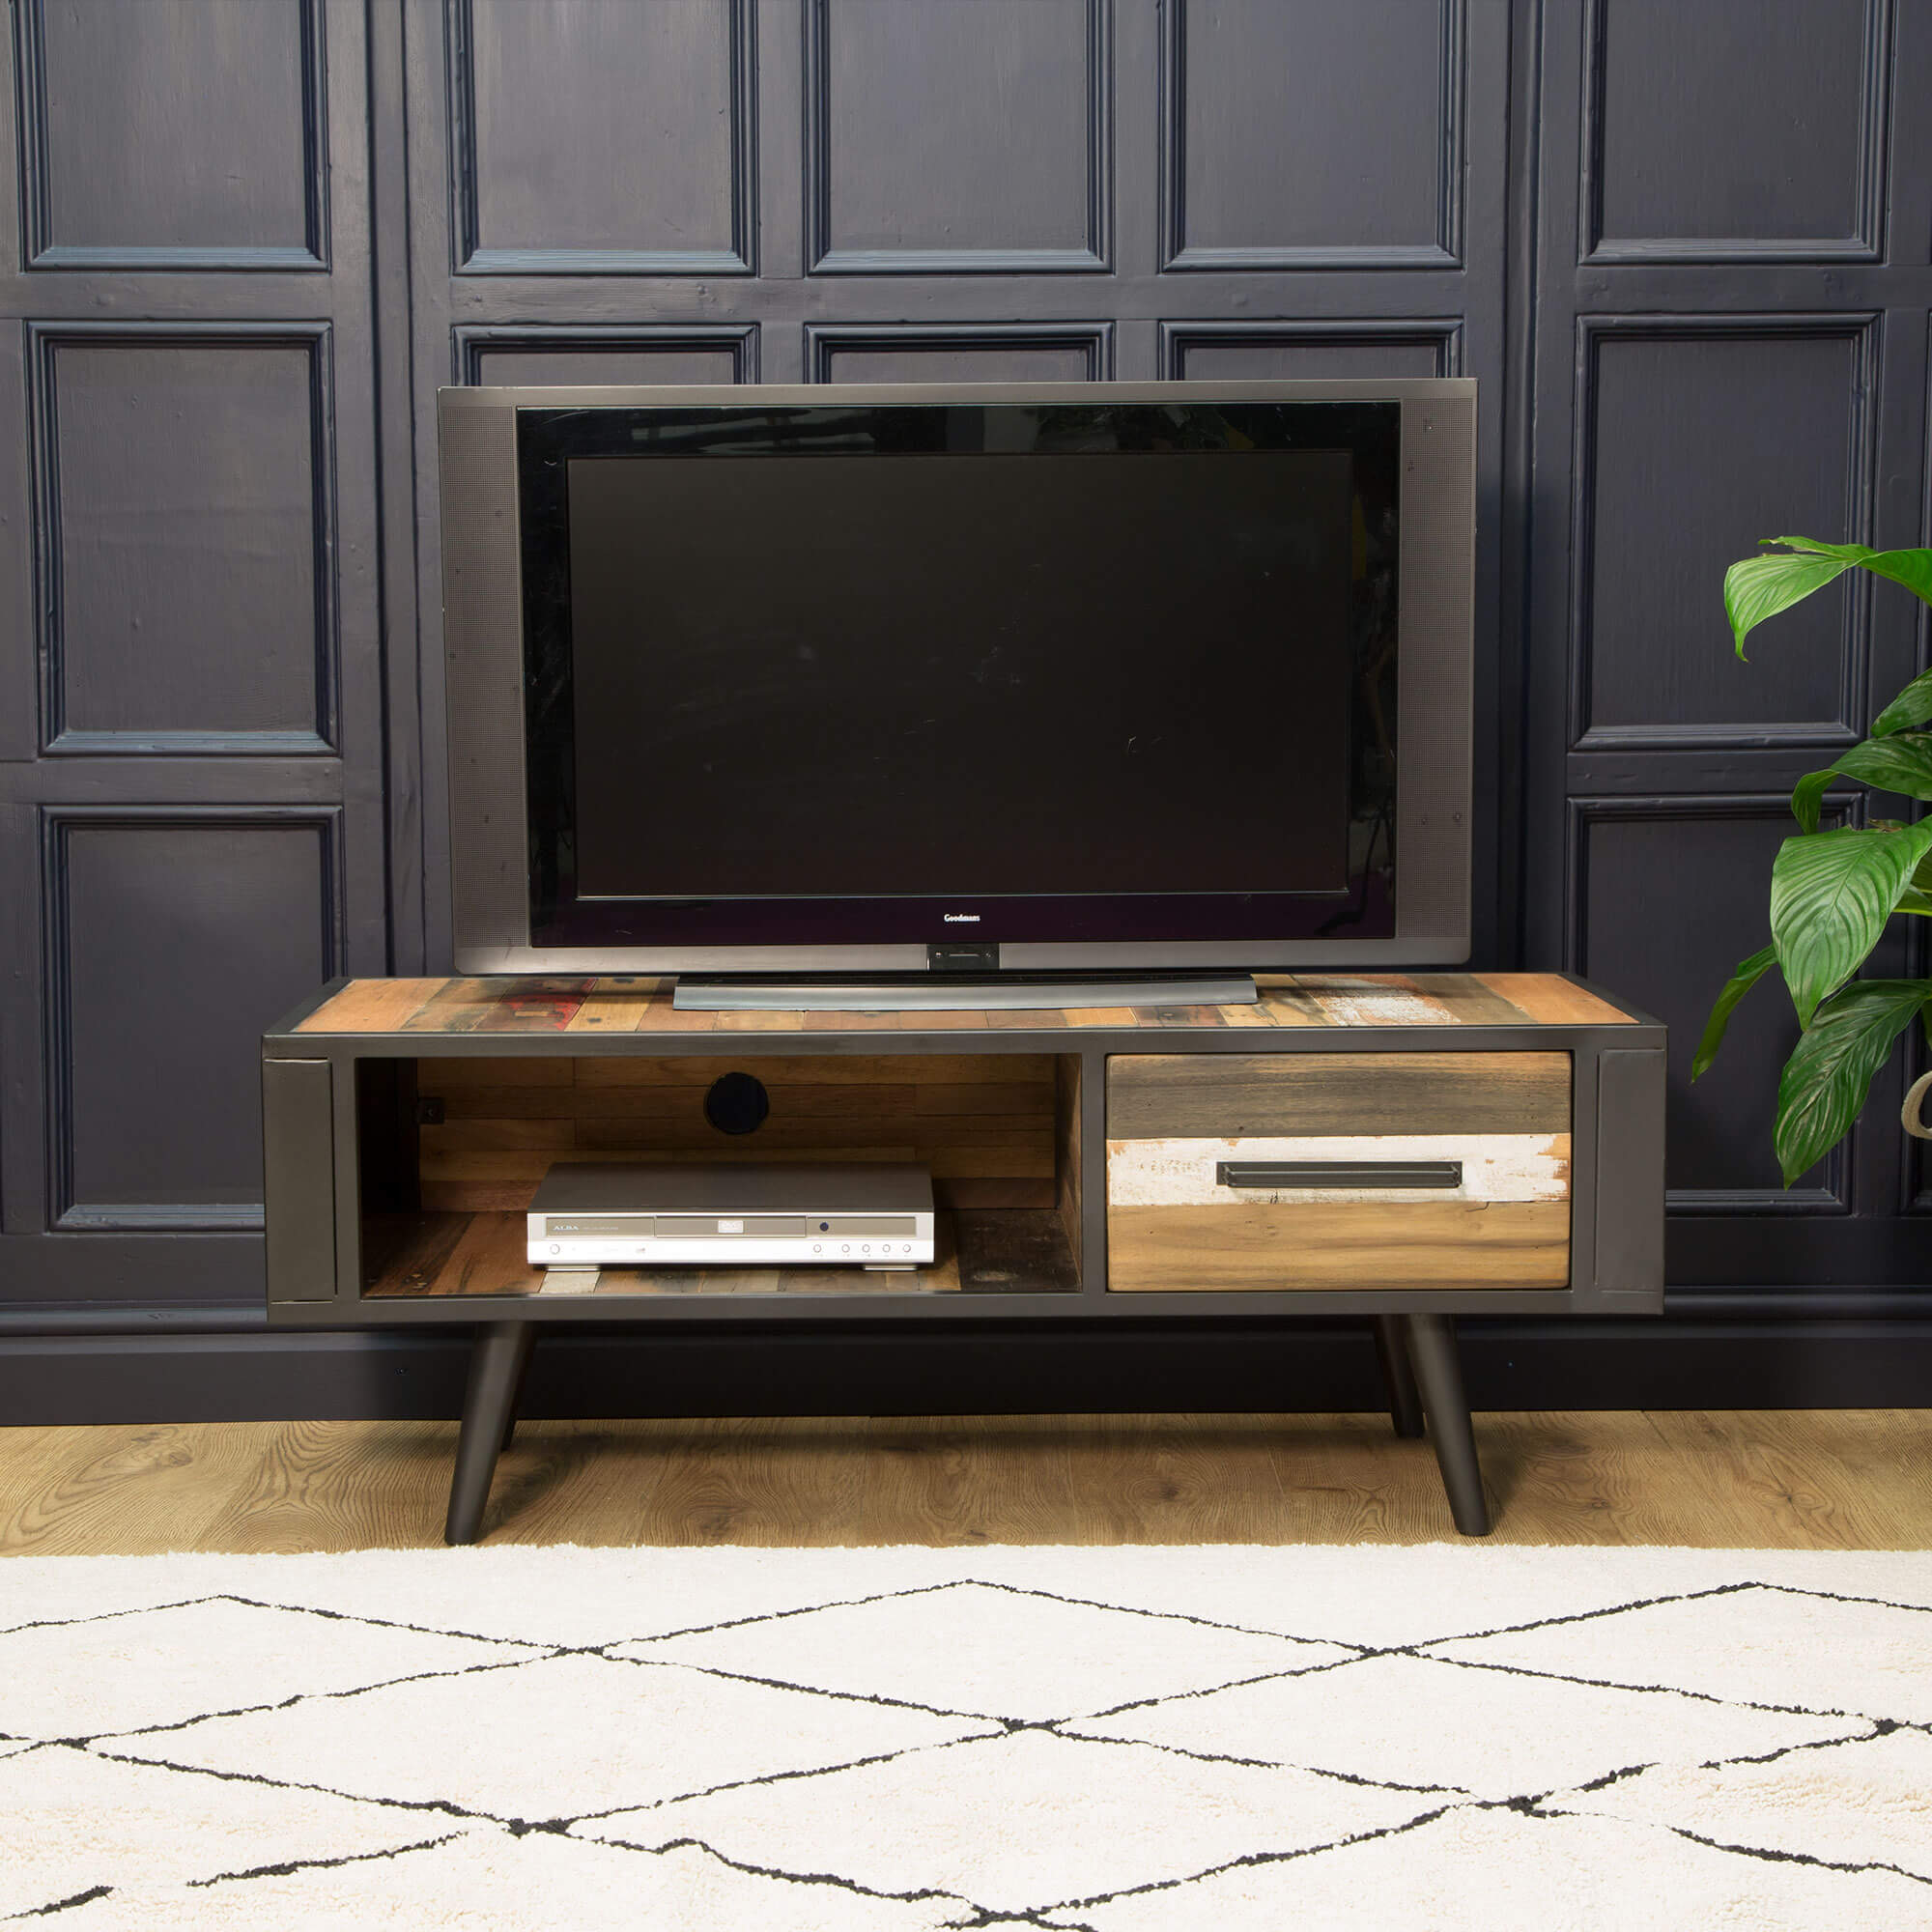 Mango Wood|Reclaimed Wood | Coffee Table|TV Stand | FSUK-BBTIC65